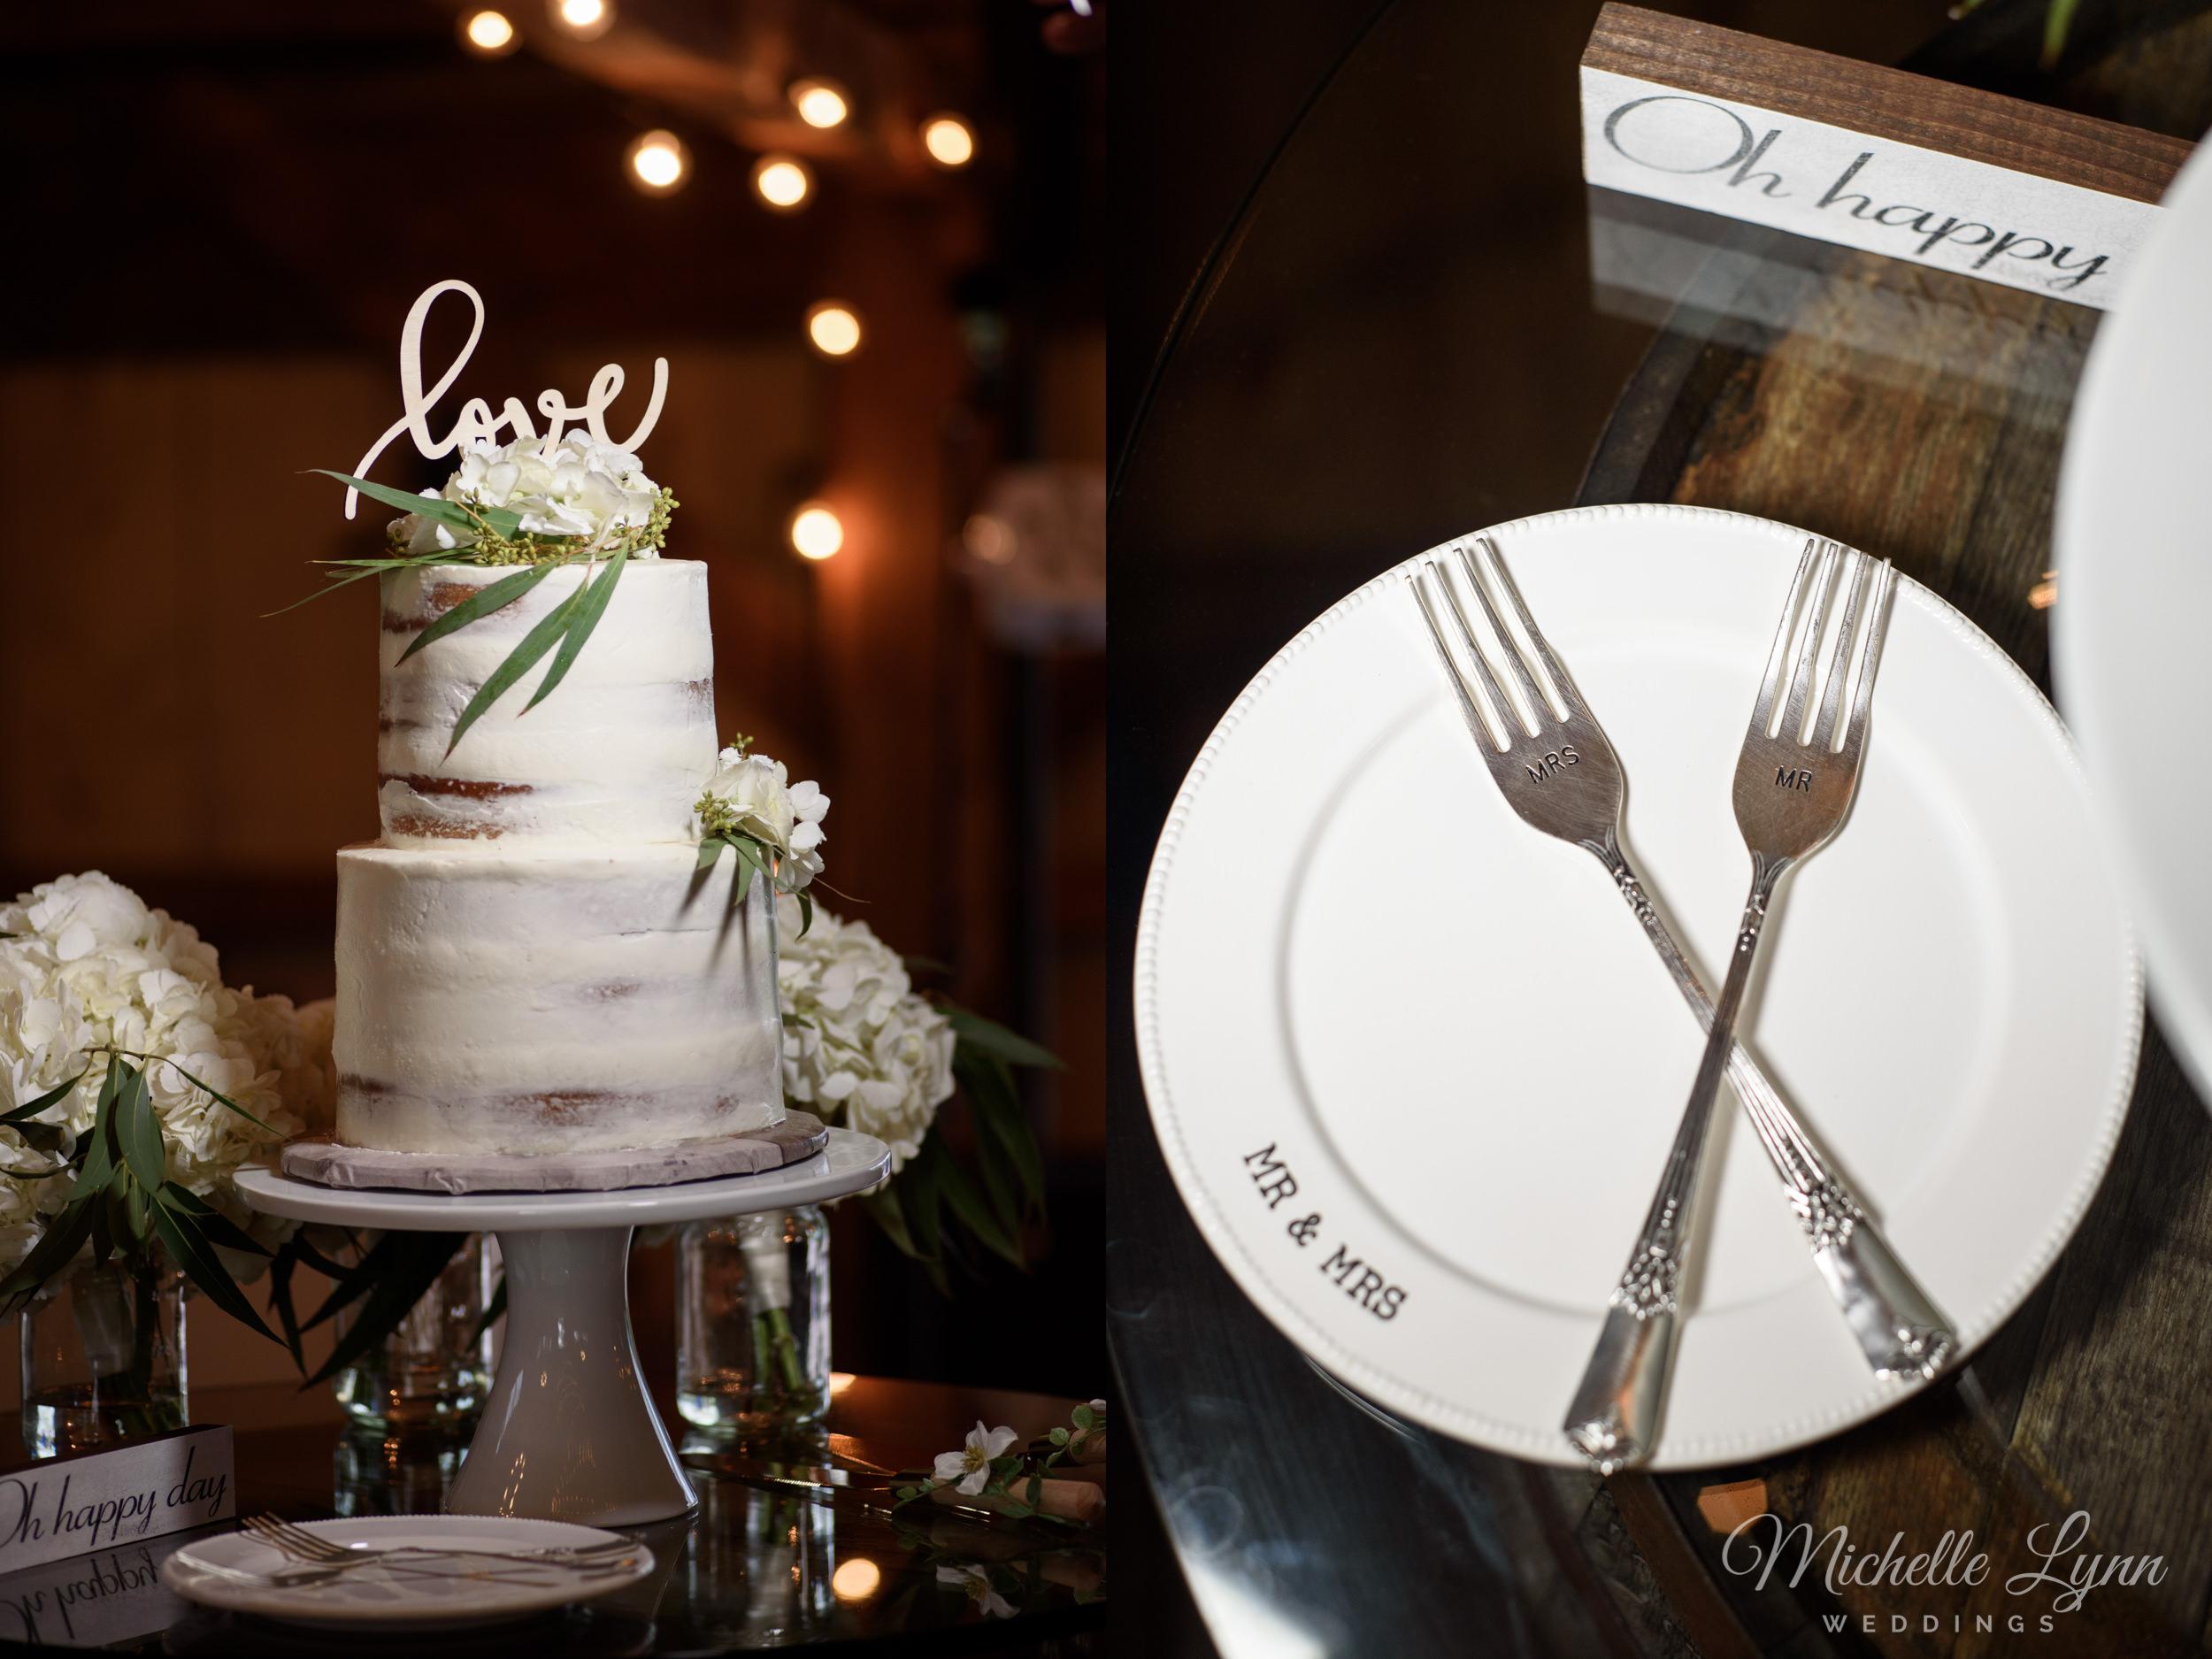 mlw-the-farm-bakery-and-events-wedding-photos-71.jpg